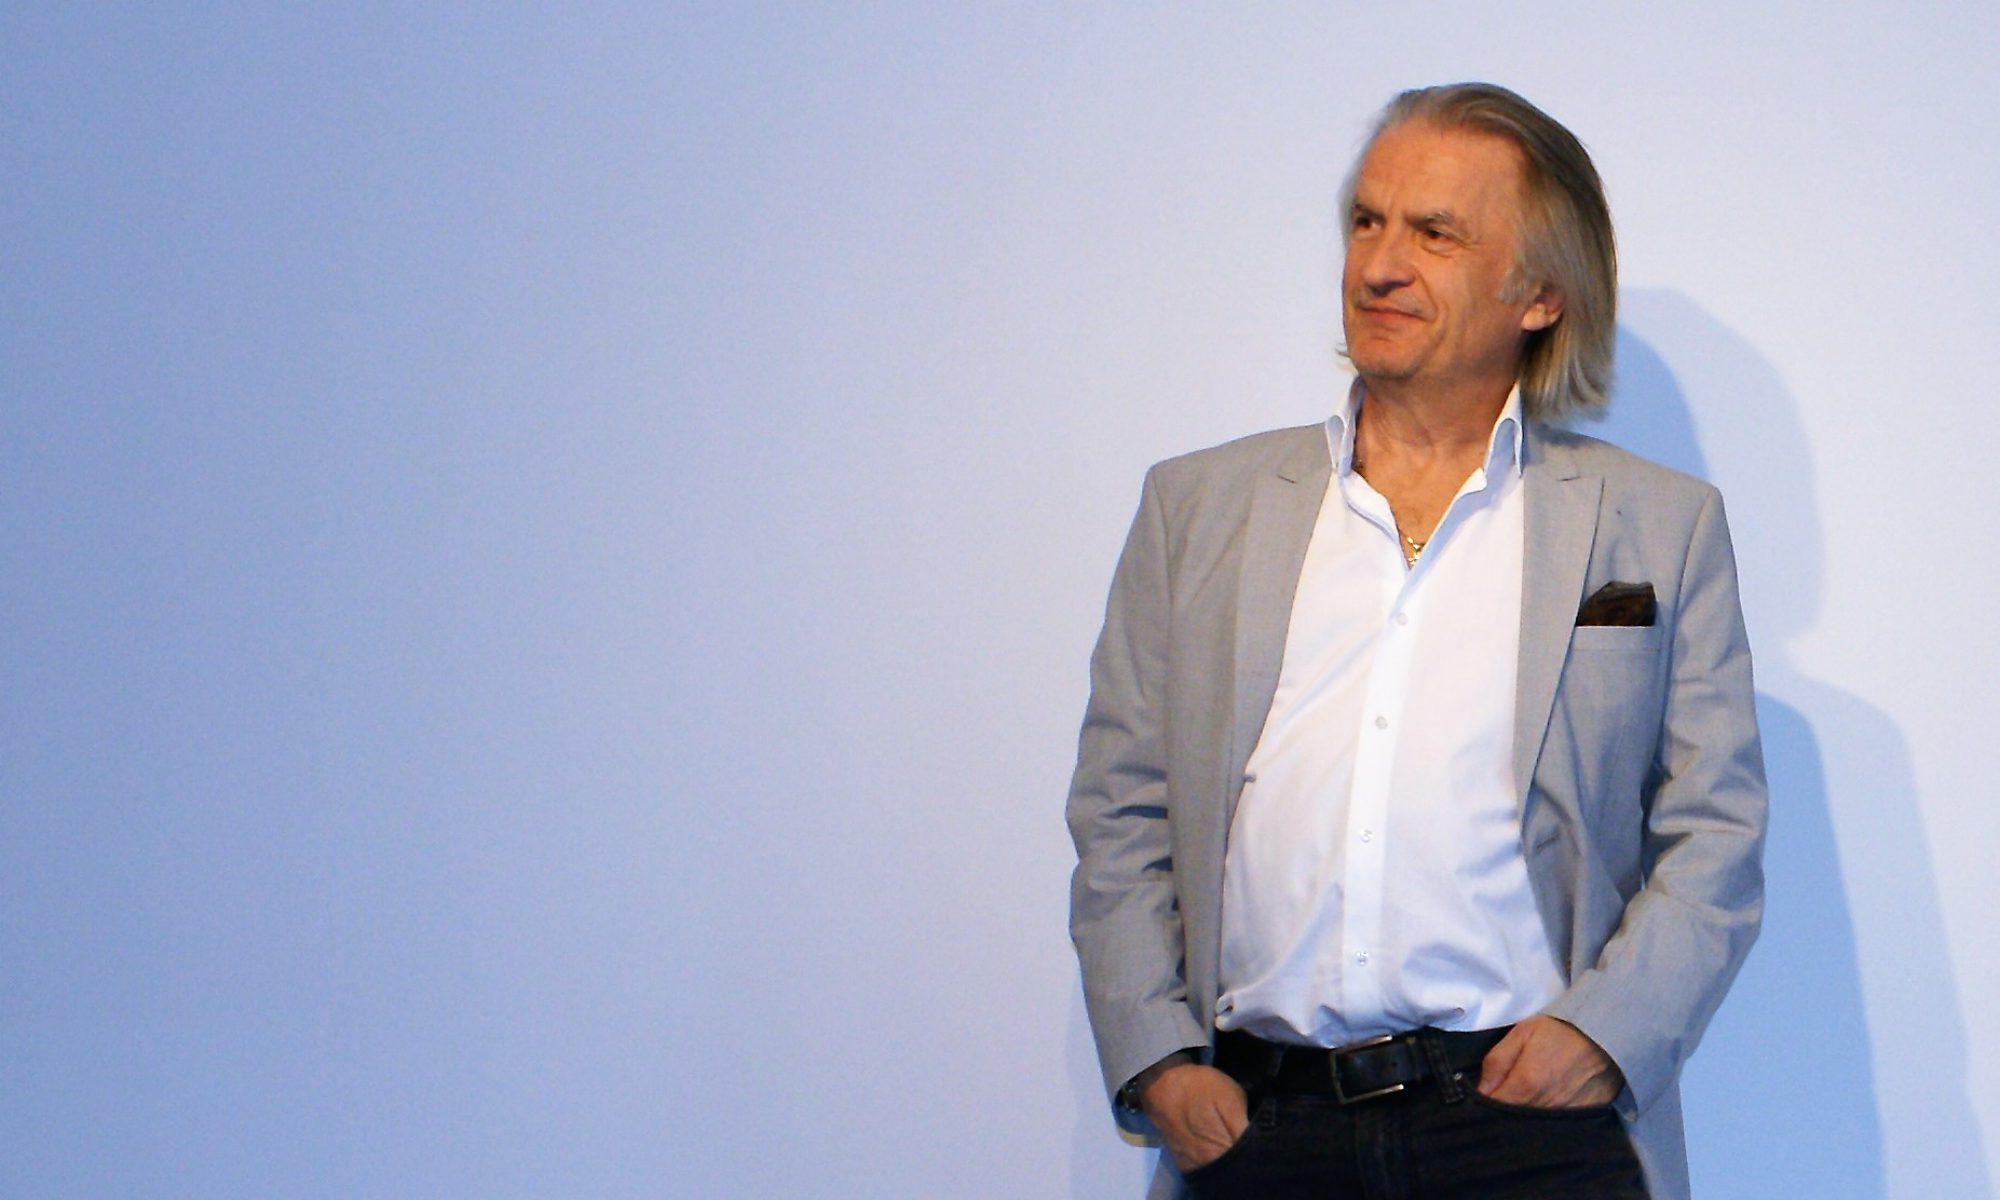 Wolfgang Ficzko